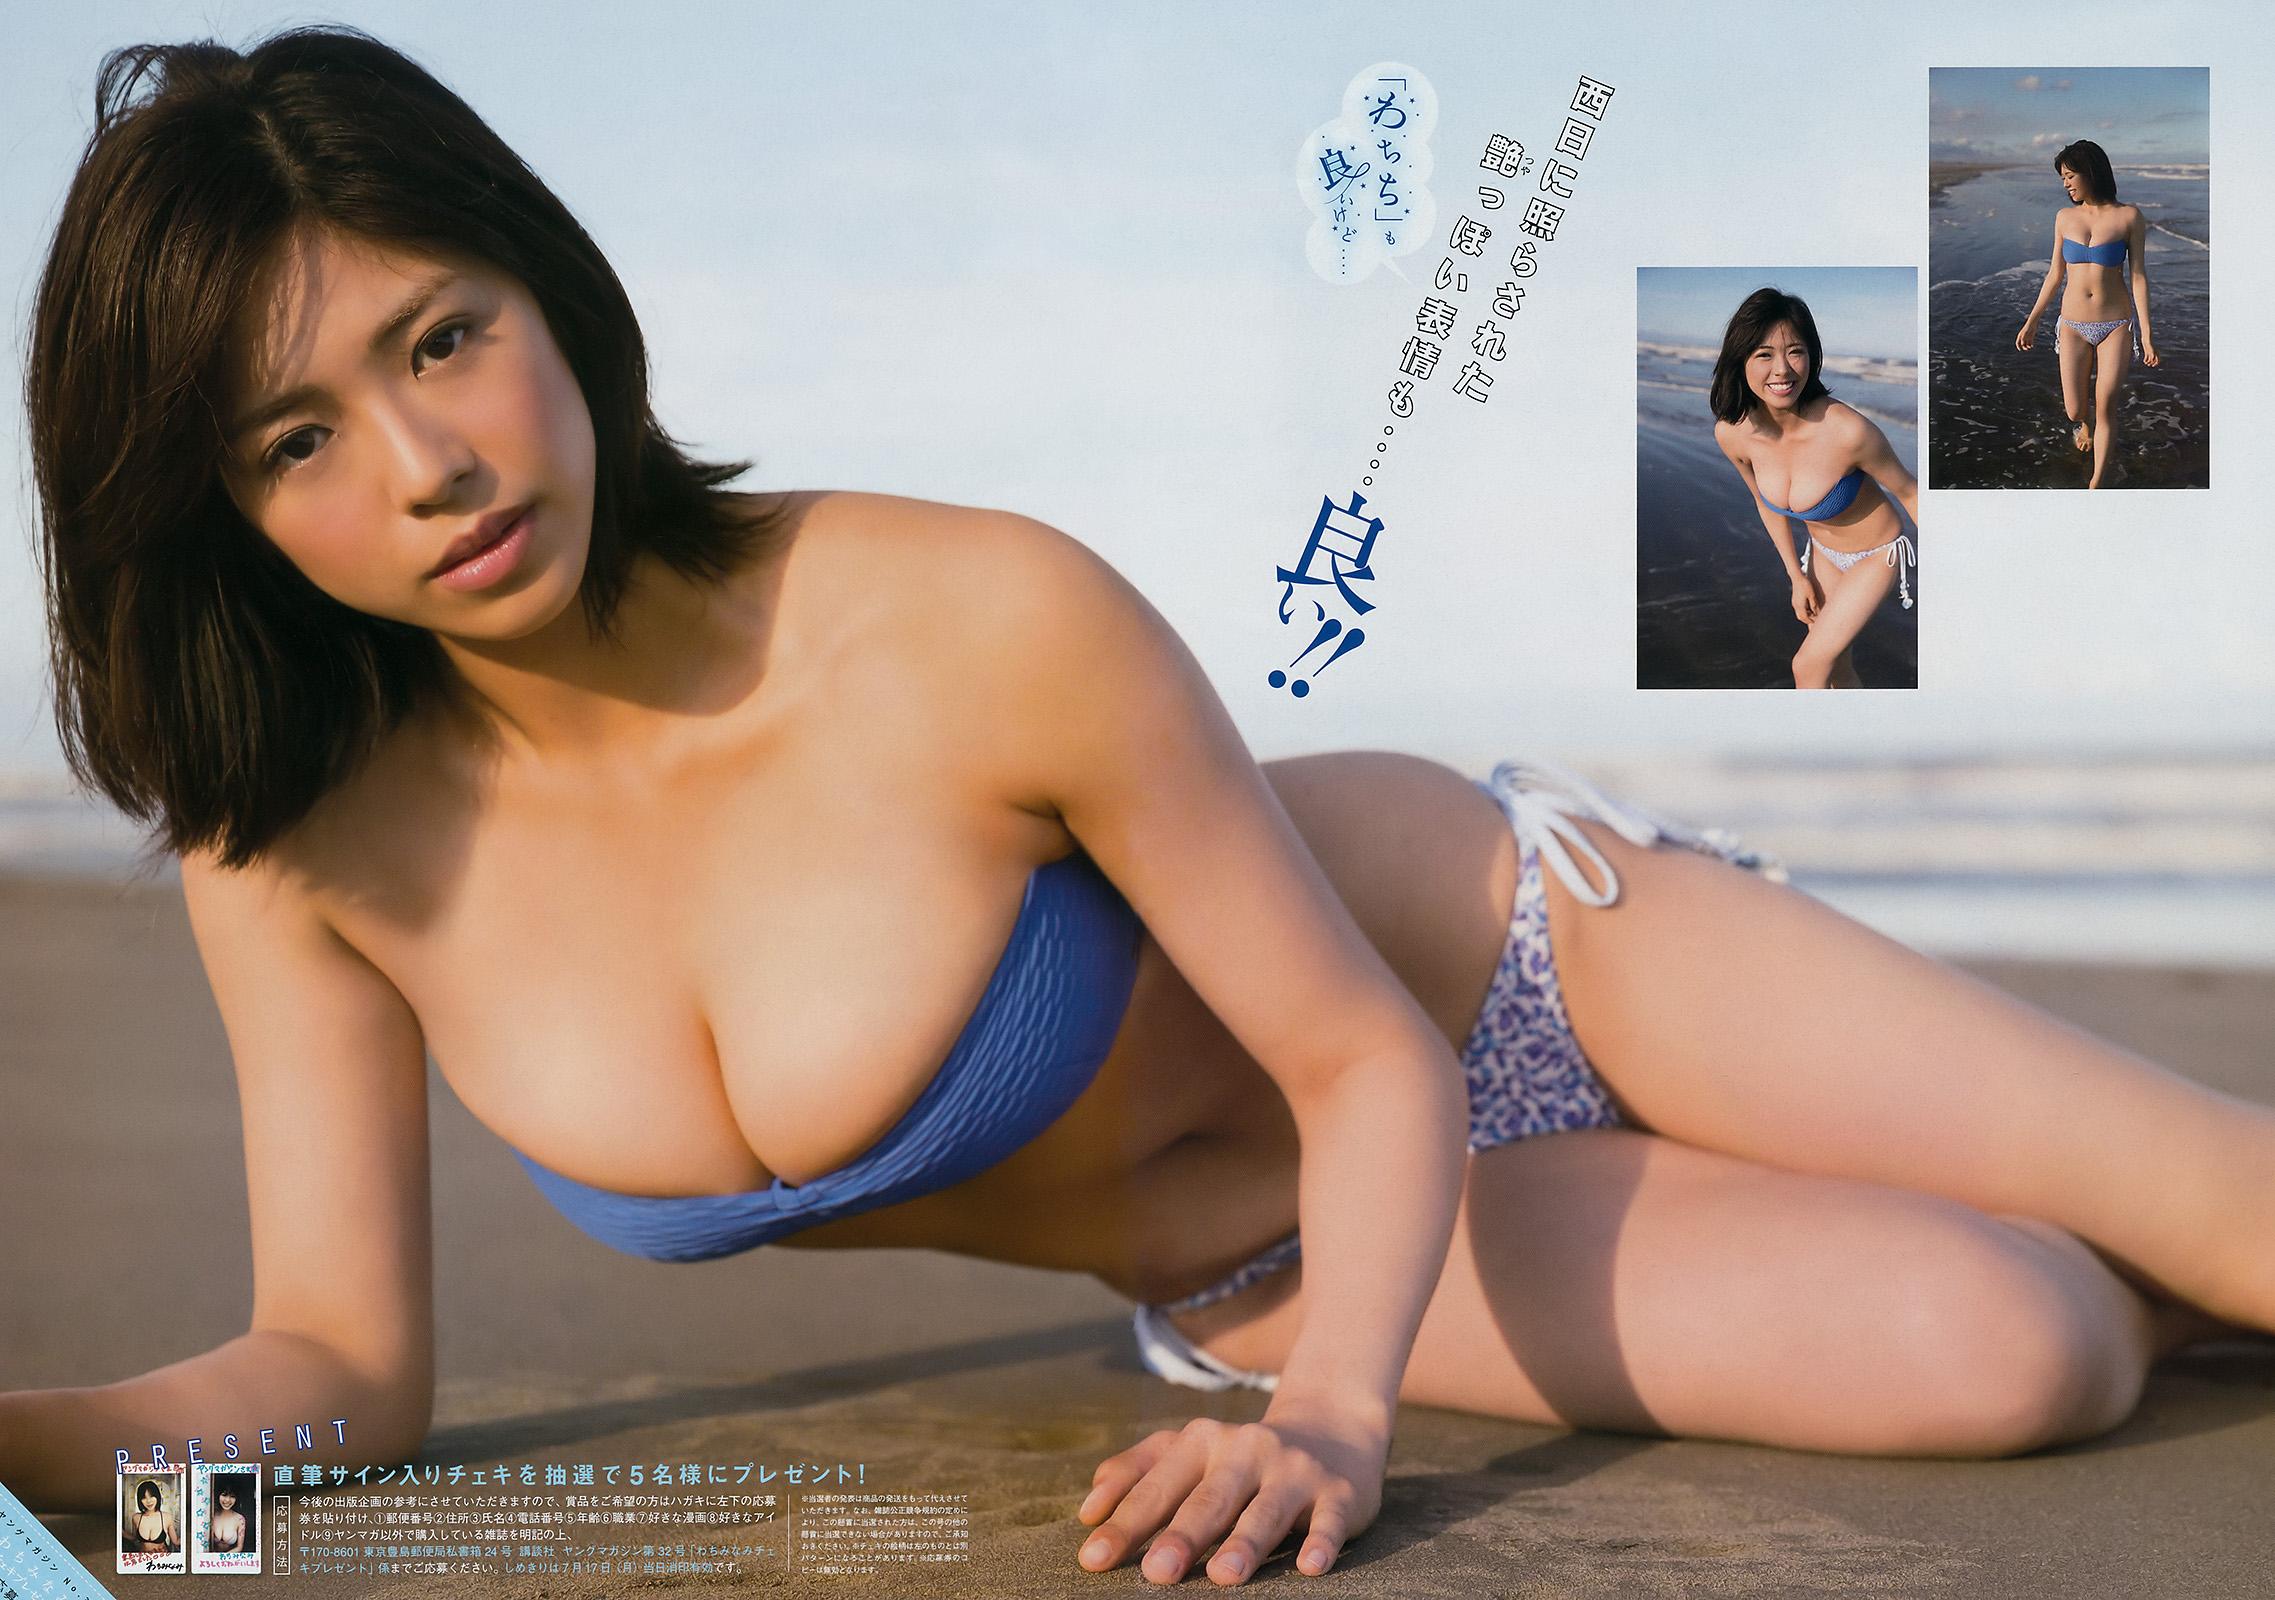 image http://scanlover.com/assets/images/2952-S2ECALT1tMumhXY3.jpeg